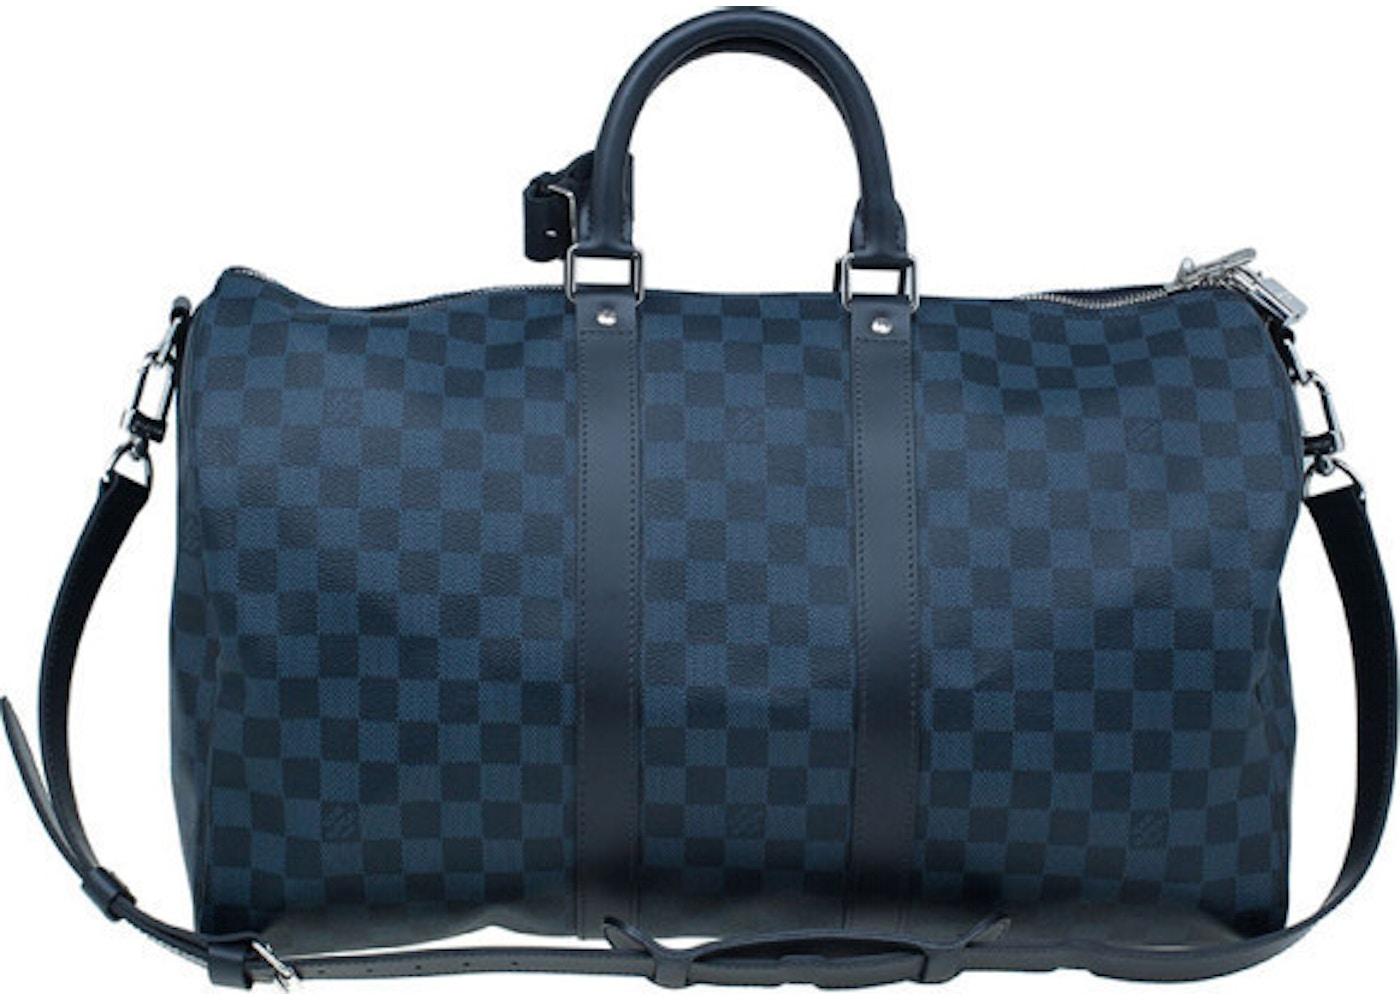 69965c957d63 Louis Vuitton Keepall Bandouliere Damier Cobalt 55 Blue